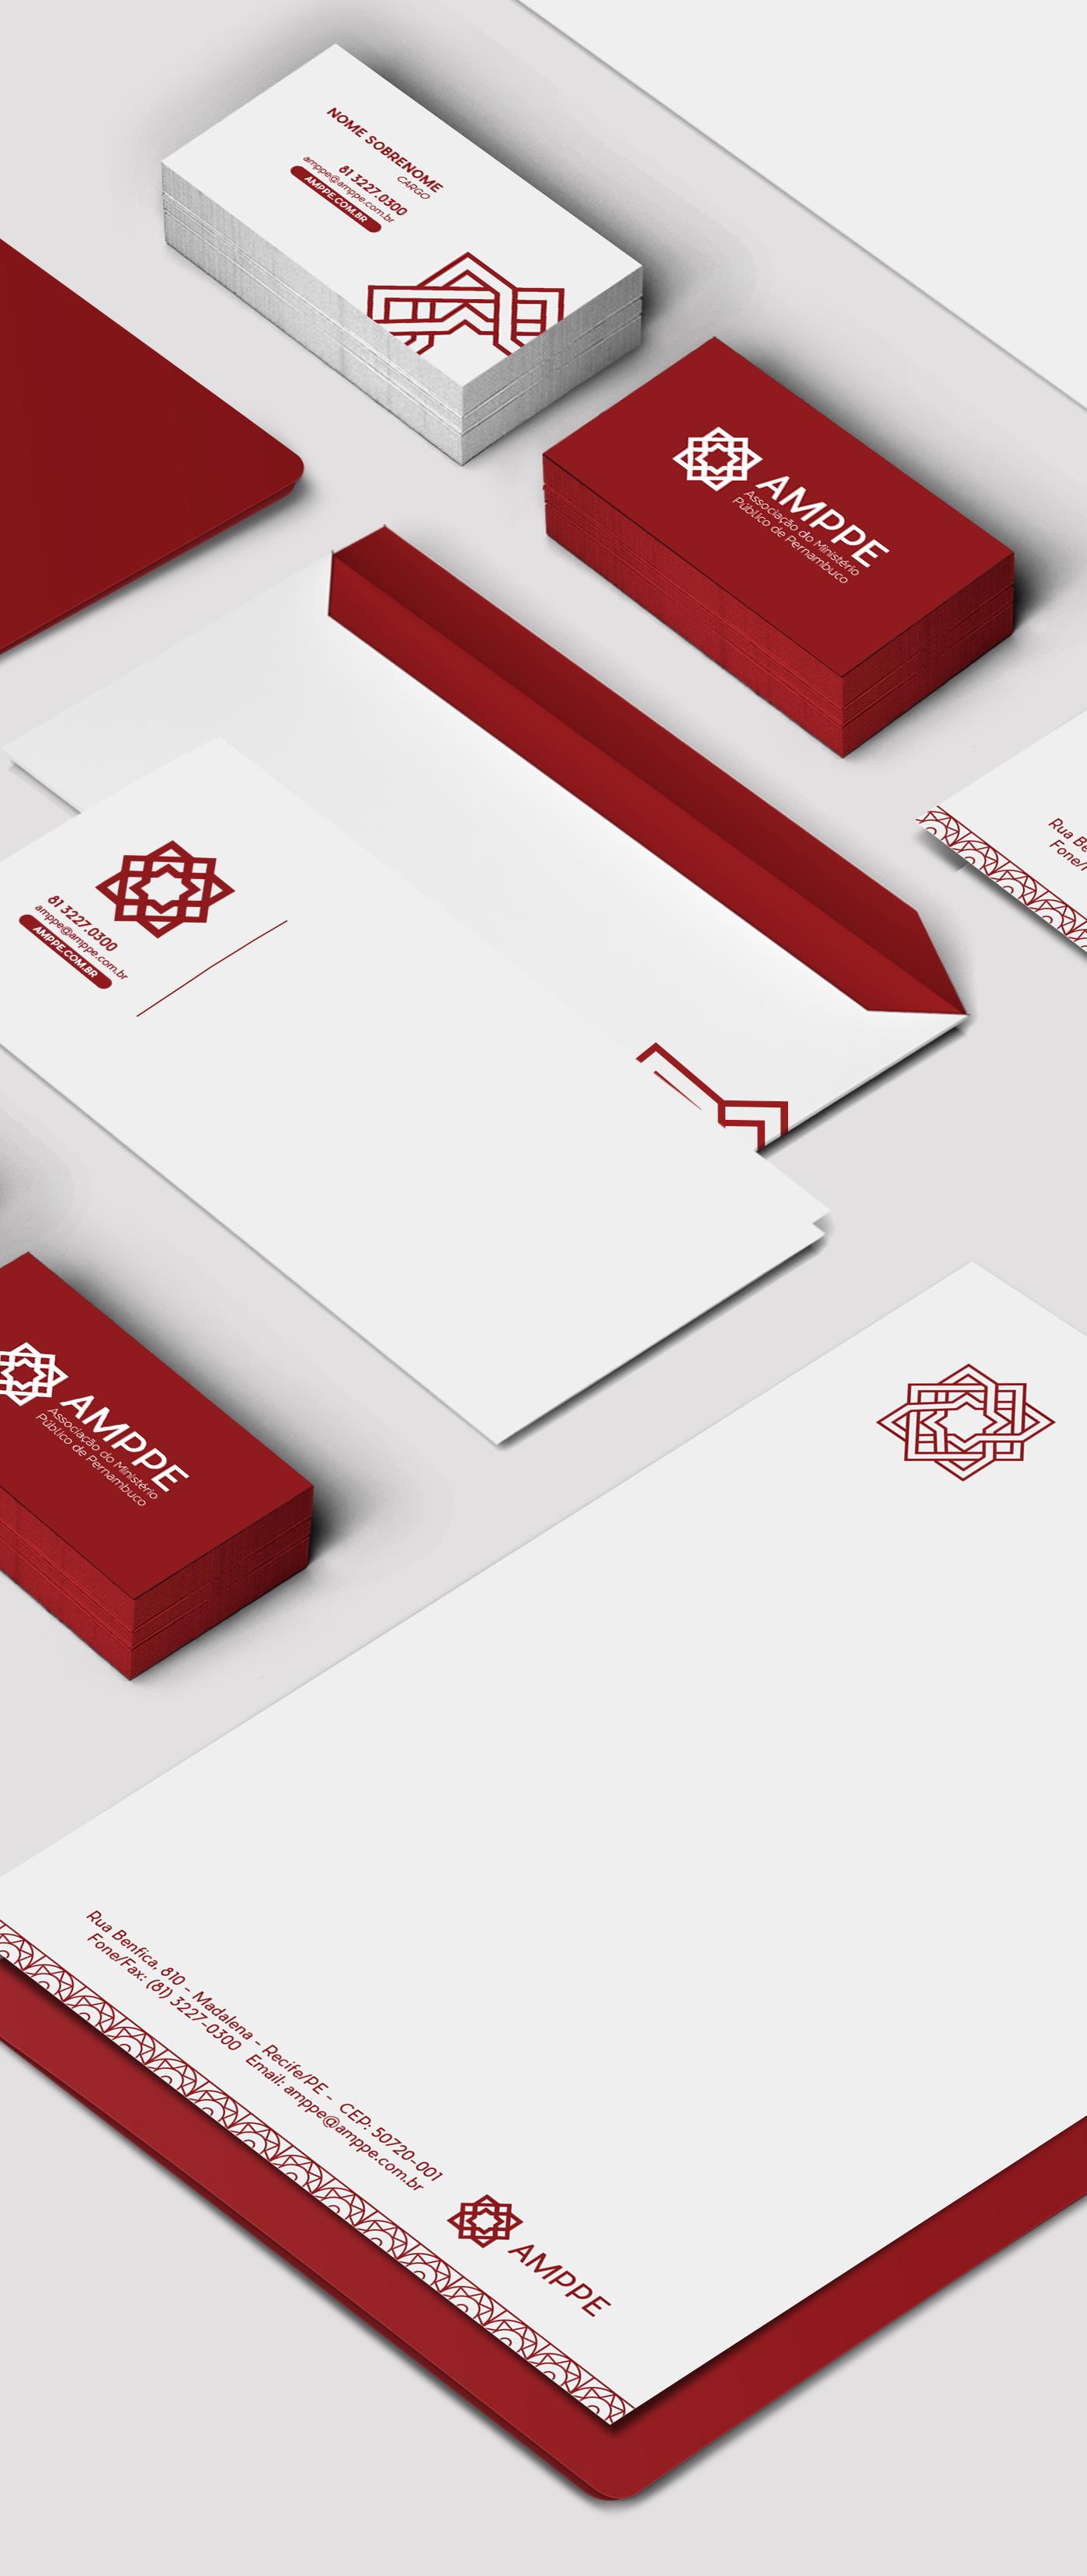 brand Logotype pernambuco recife stationary red Association logo visual identity